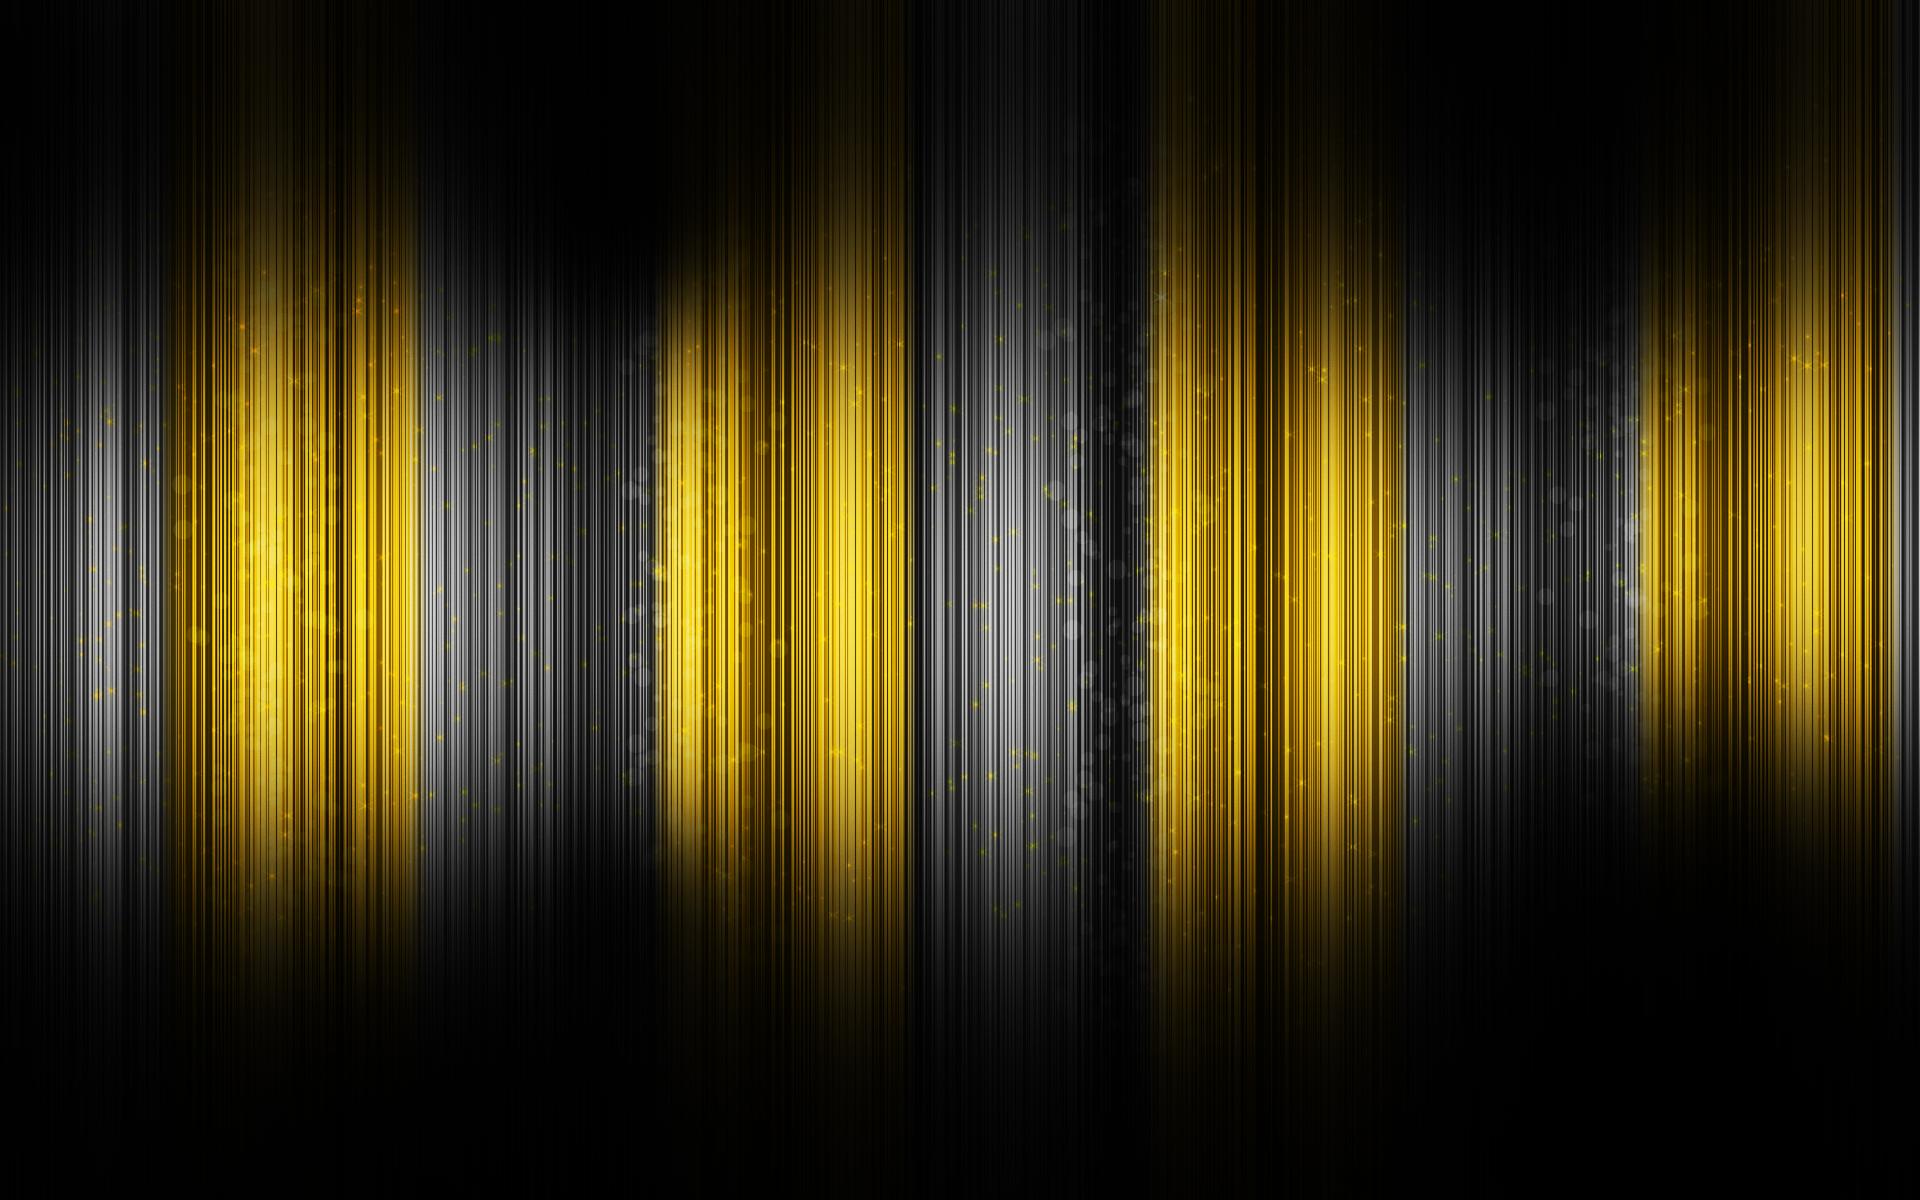 pattern hd wallpaper background image 1920x1200 id 439552